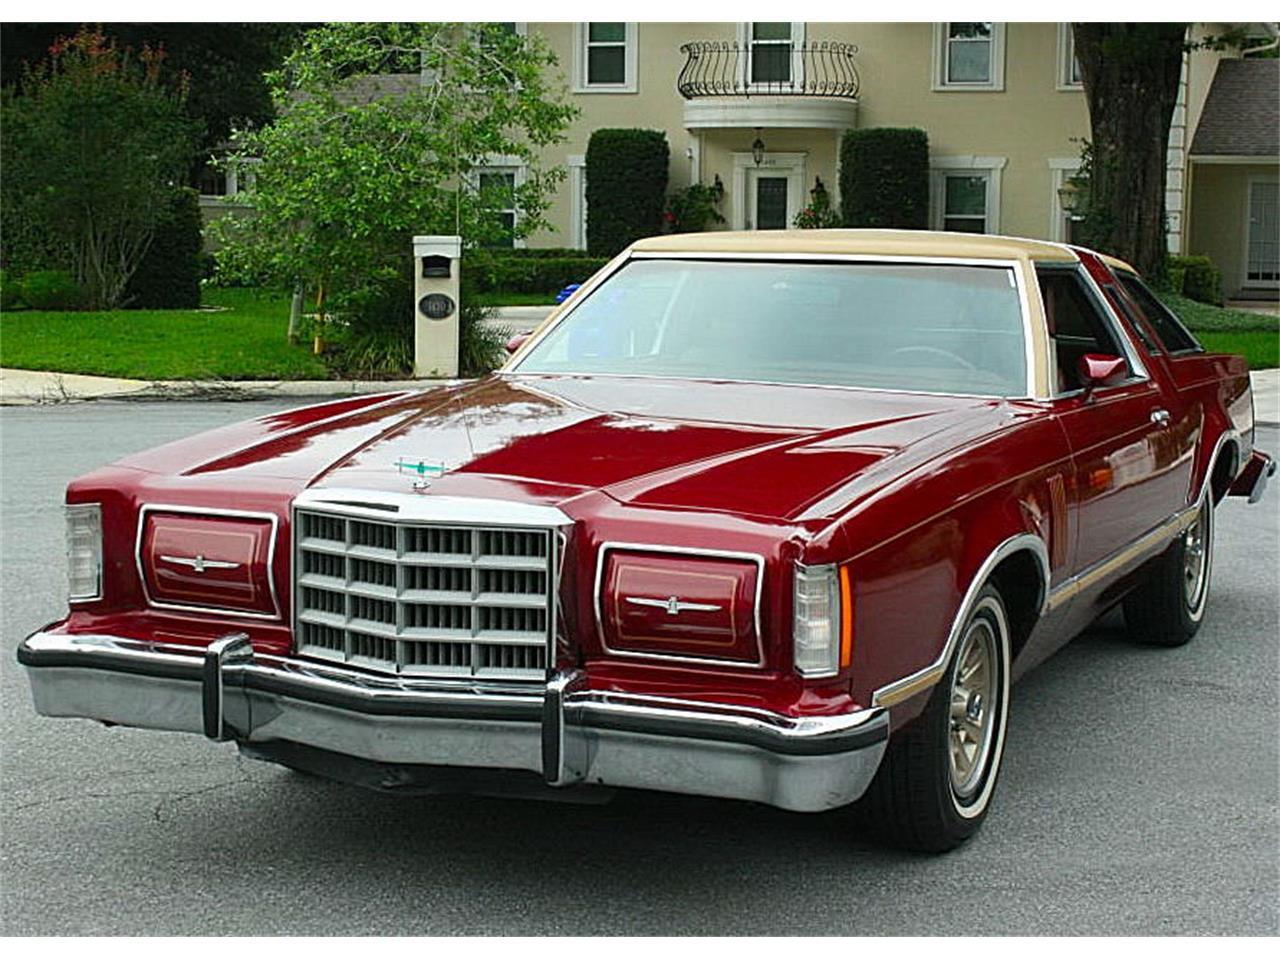 1979 Ford Thunderbird for Sale | ClassicCars.com | CC-1100582